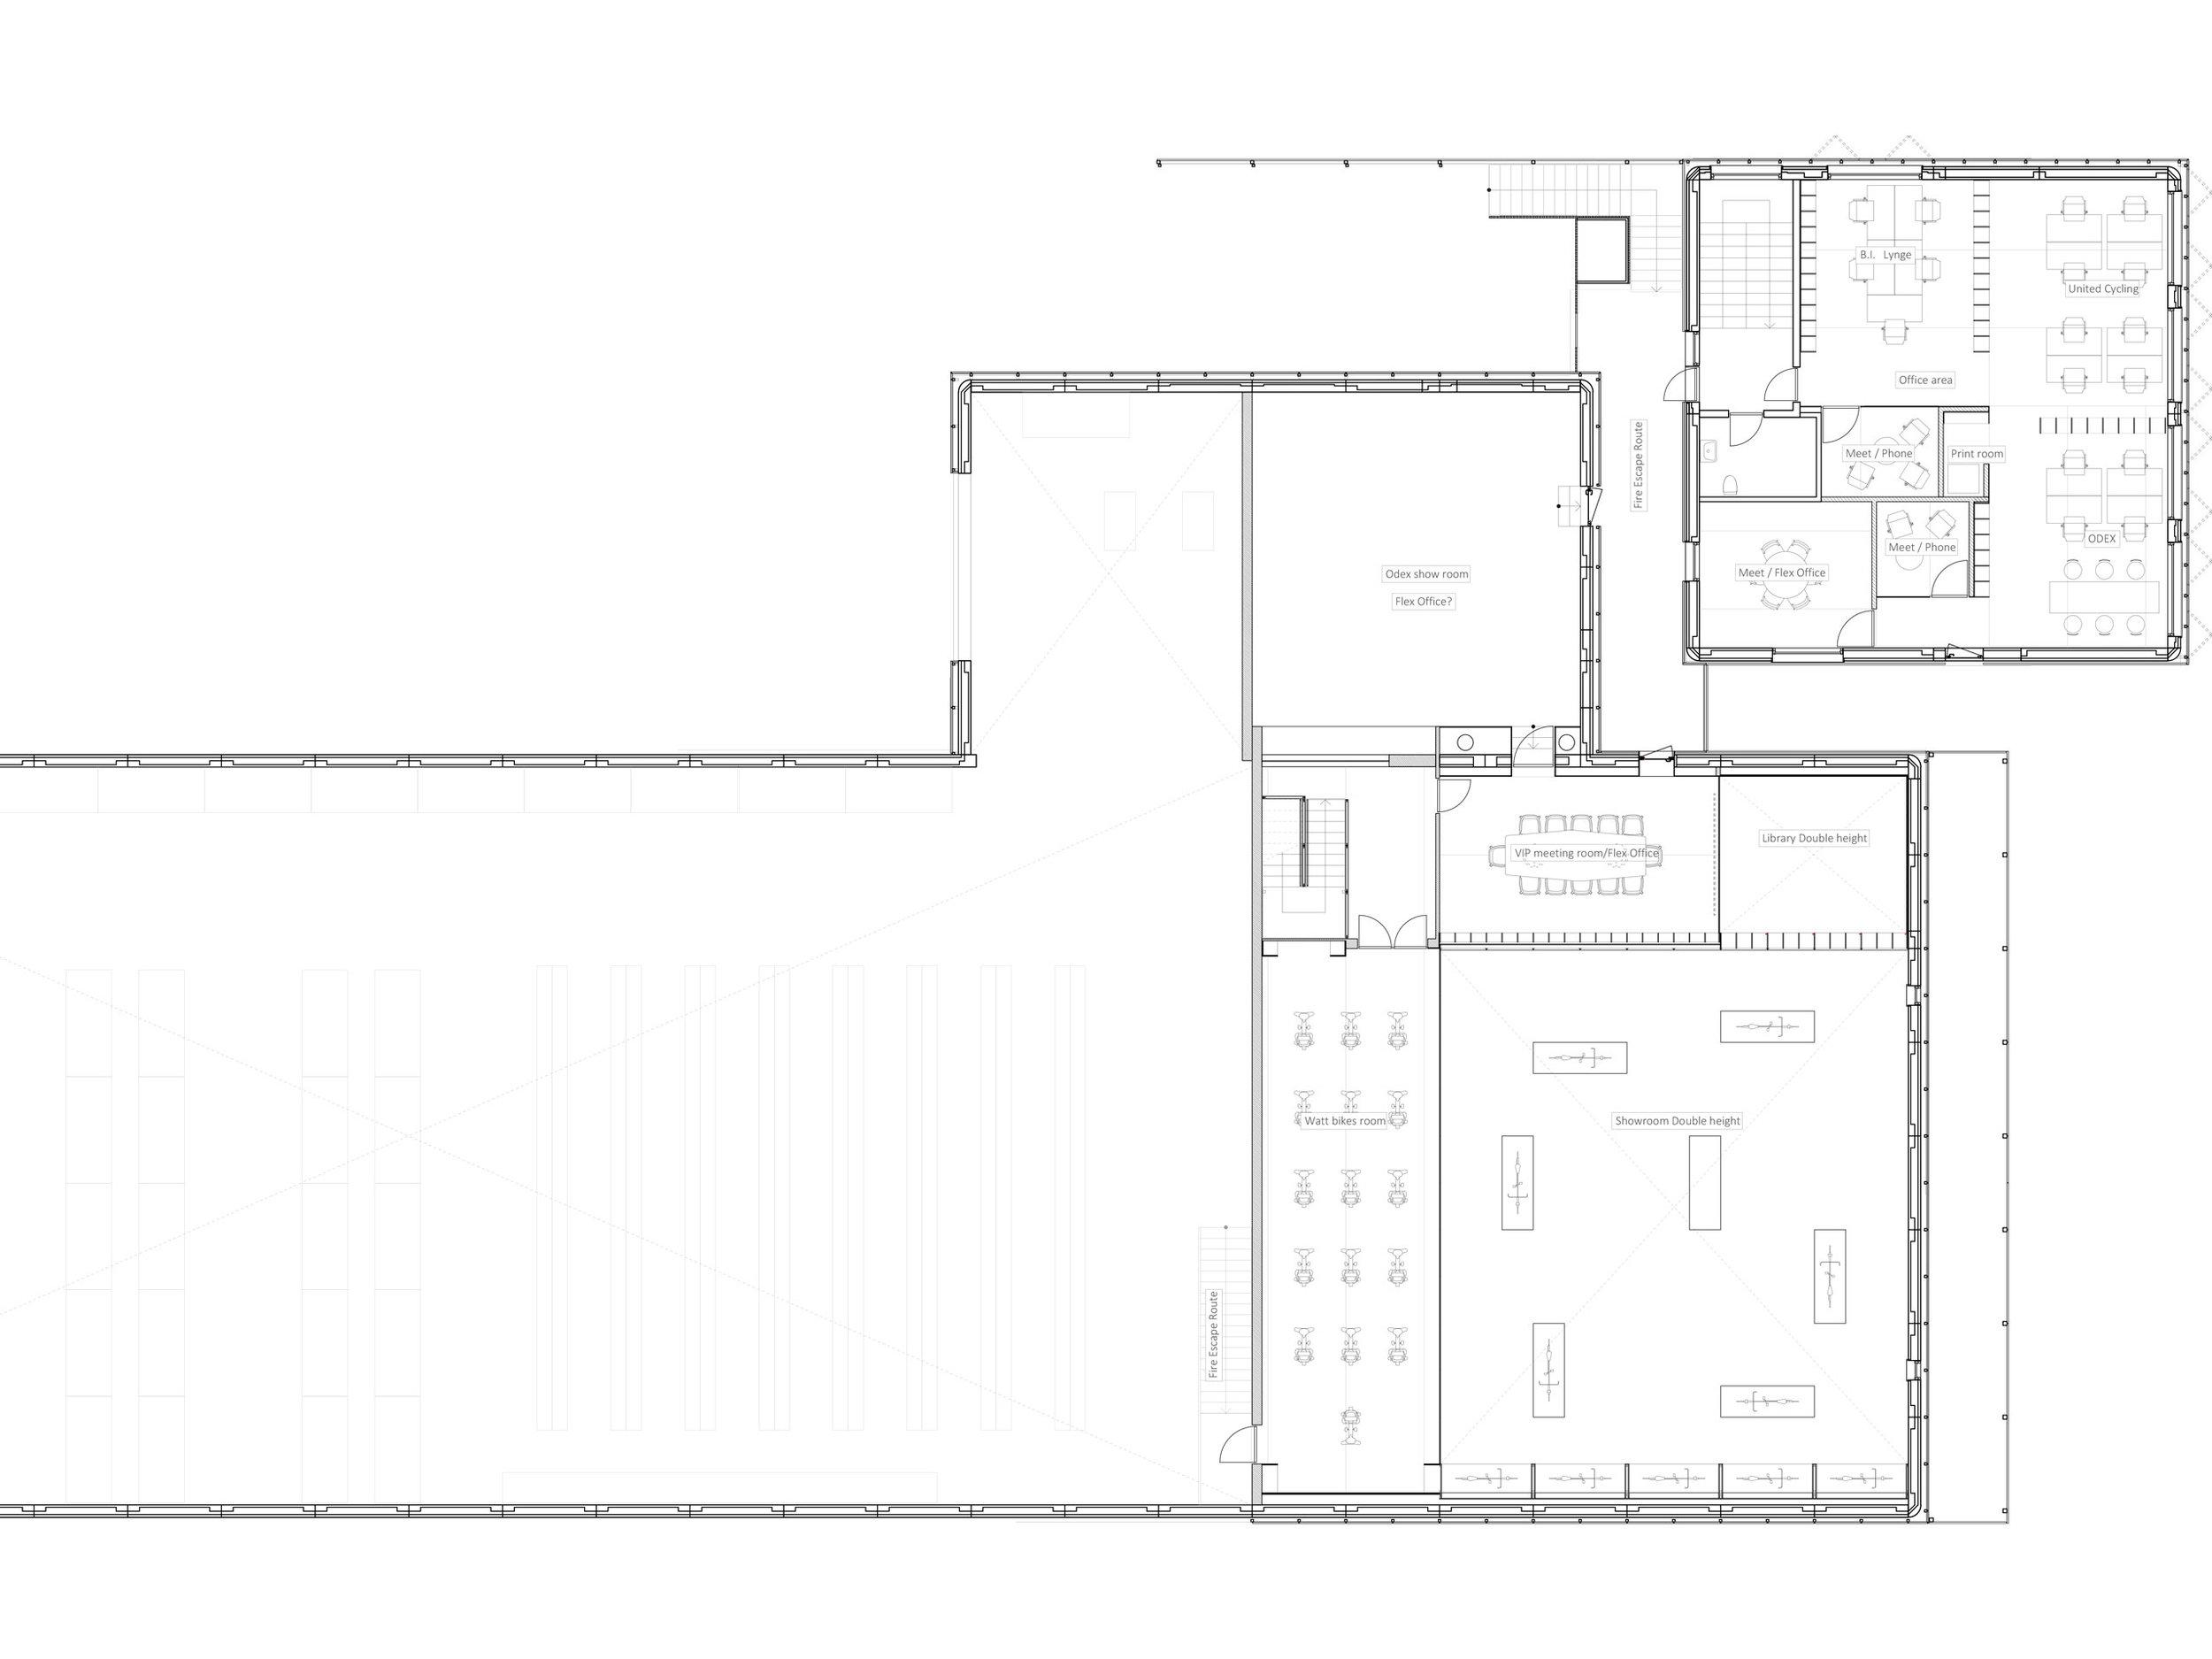 Plan, First floor, 1:150